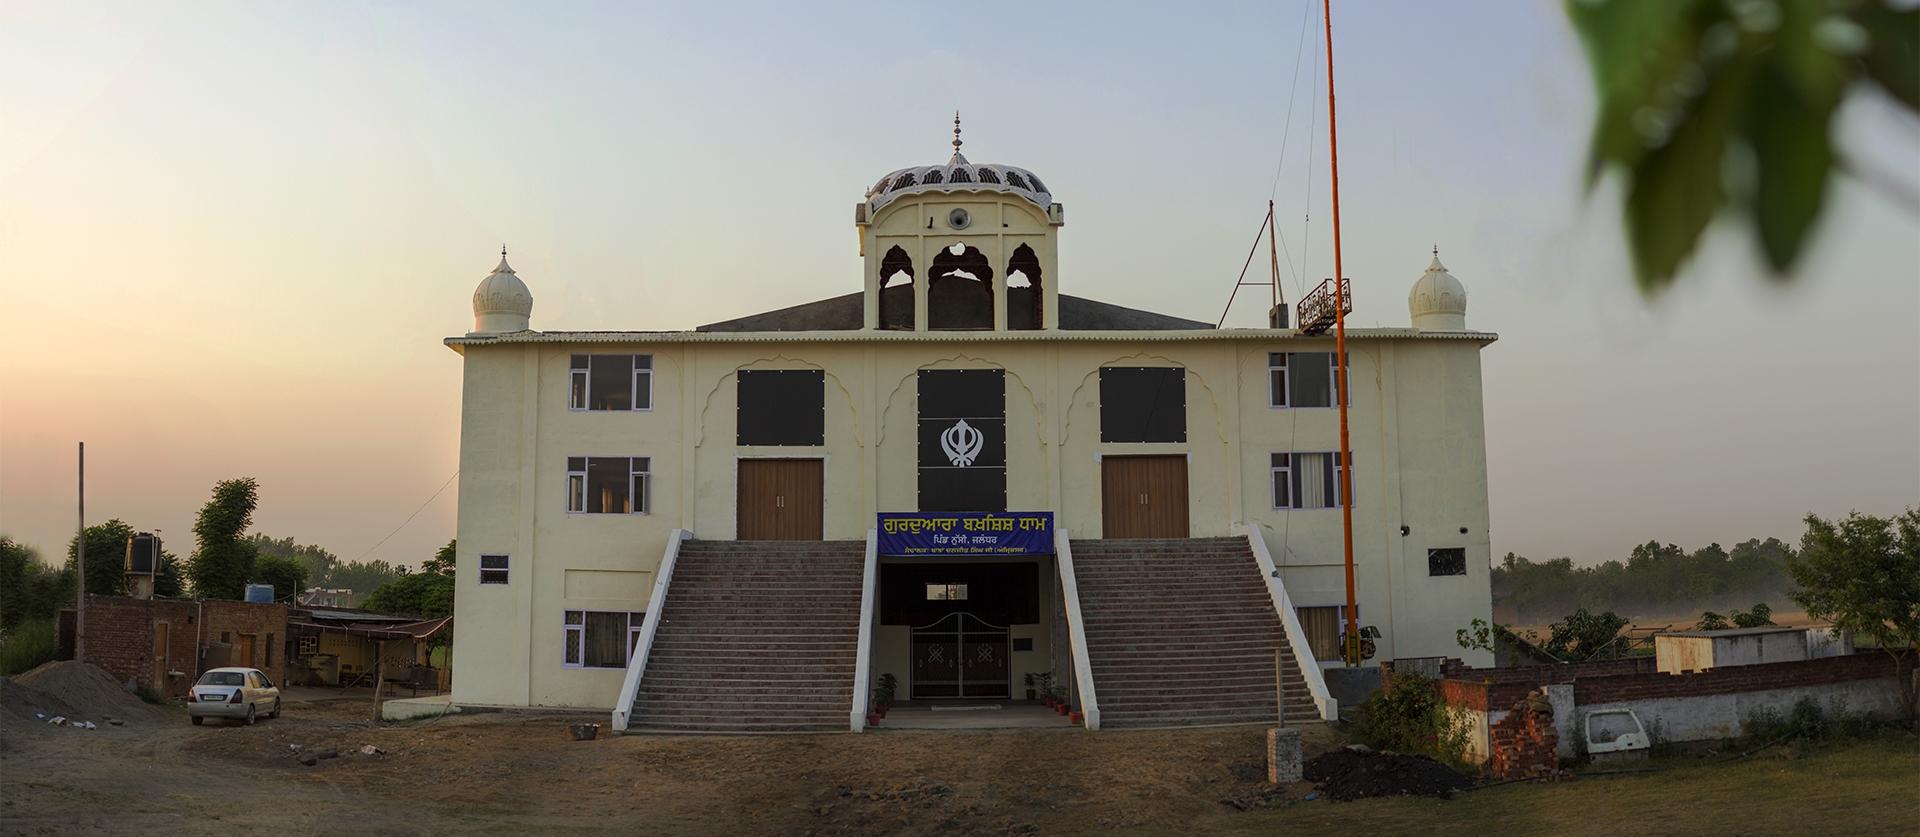 Gurdwara Bakhshish Dham, Nussi, Jalandhar